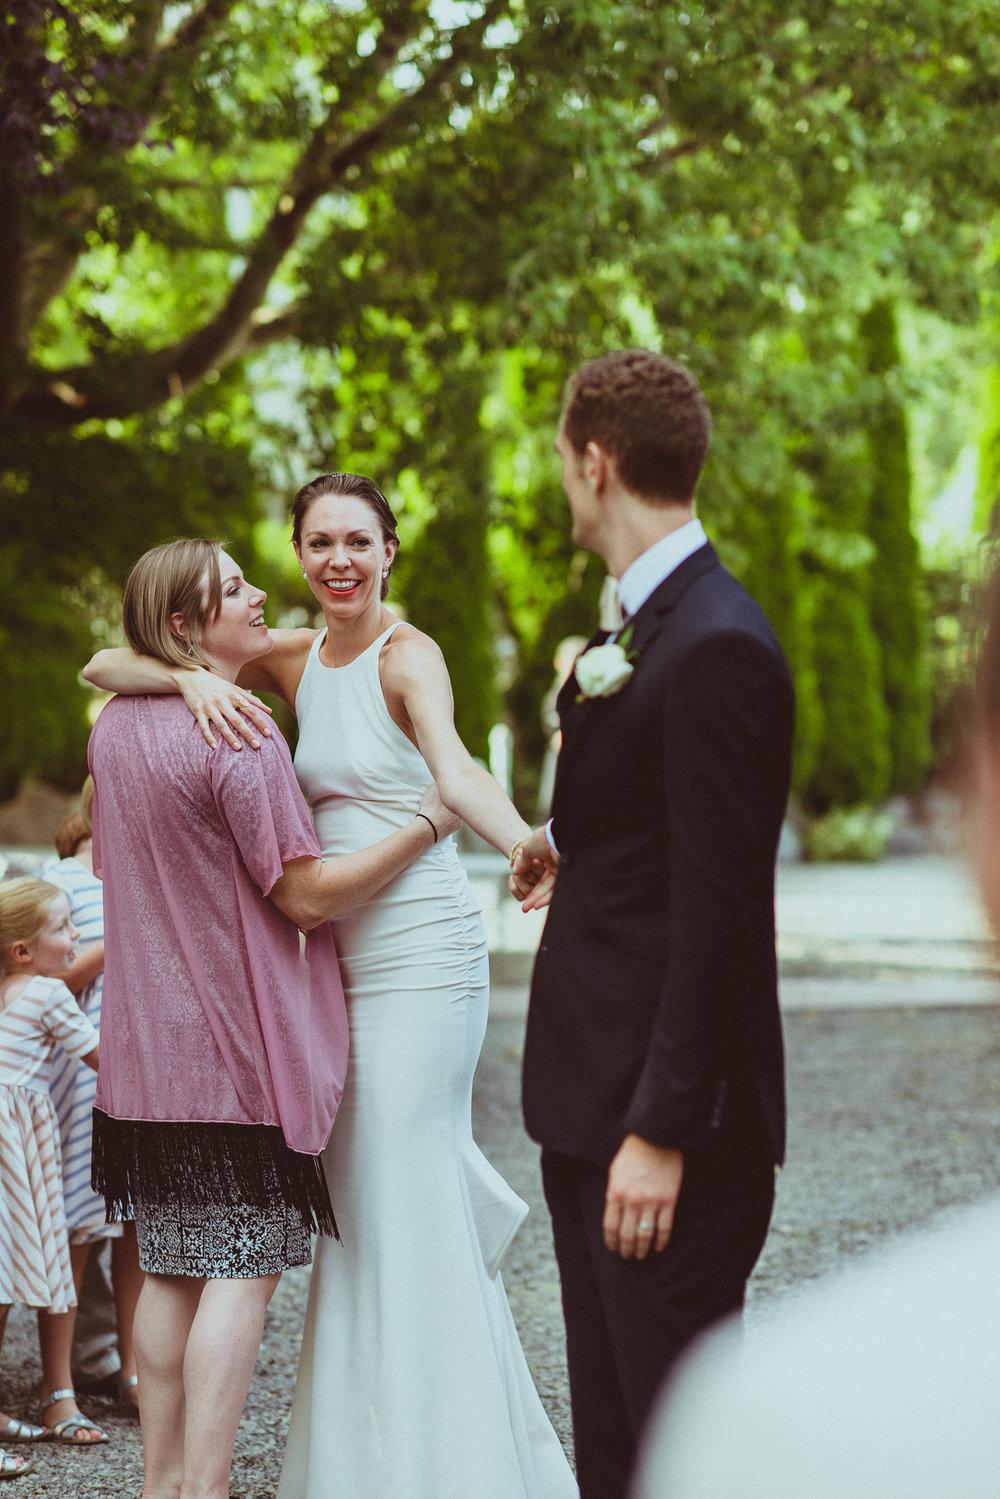 BEST_CHICAG_WEDDING_PHOTOGRAPHER_ZOE_RAIN_-78.jpg